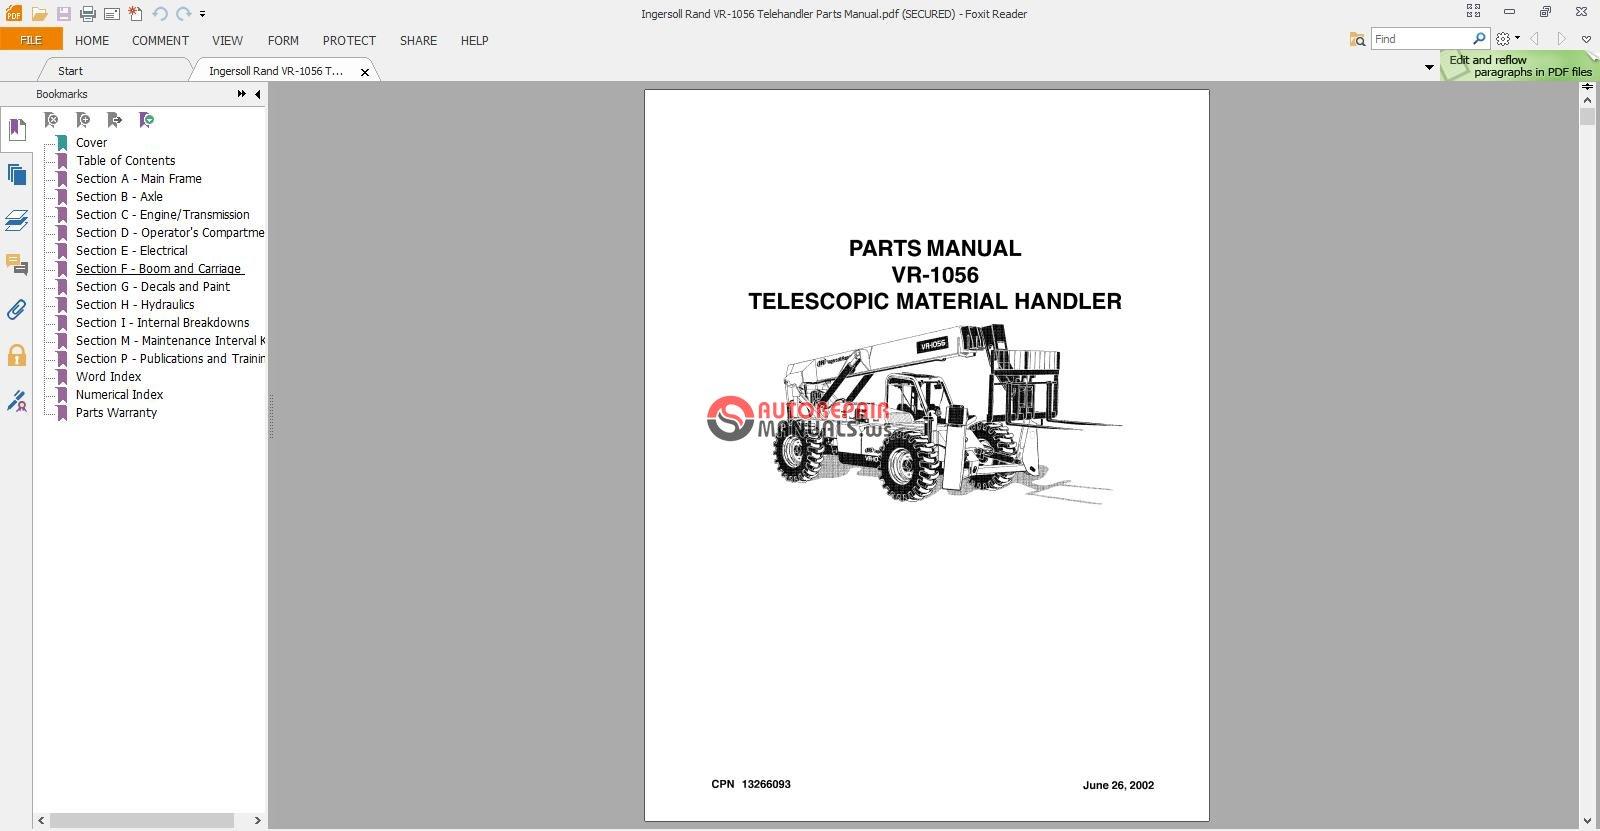 ingersoll rand forklift parts diagram online schematic diagram u2022 rh holyoak co Ingersoll Rand Fork Lift Ingersoll Rand Telescopic Forklifts